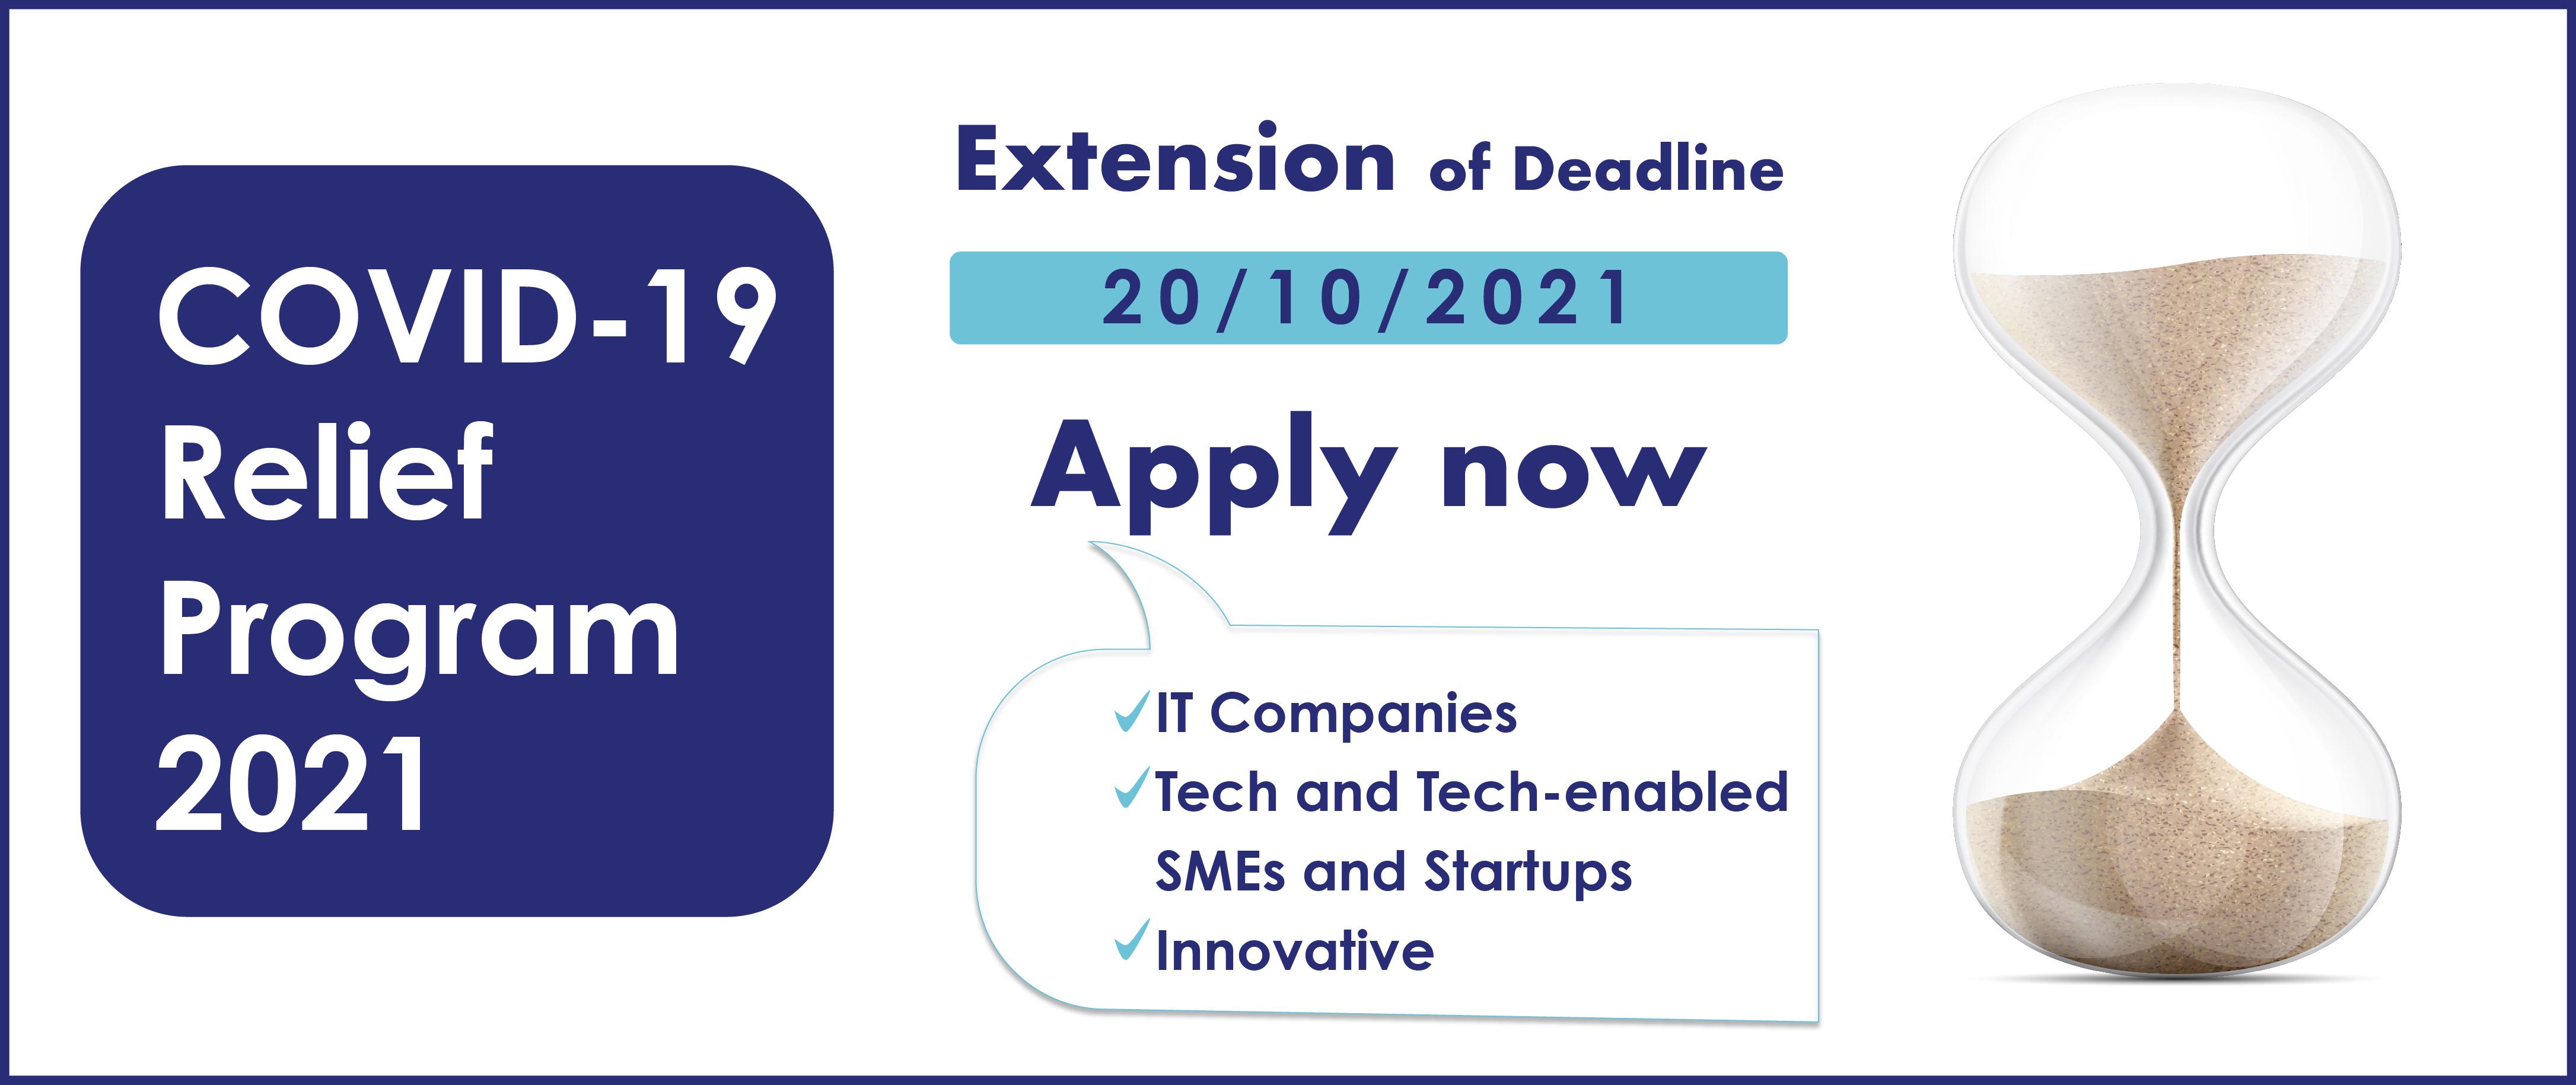 Deadline Extension